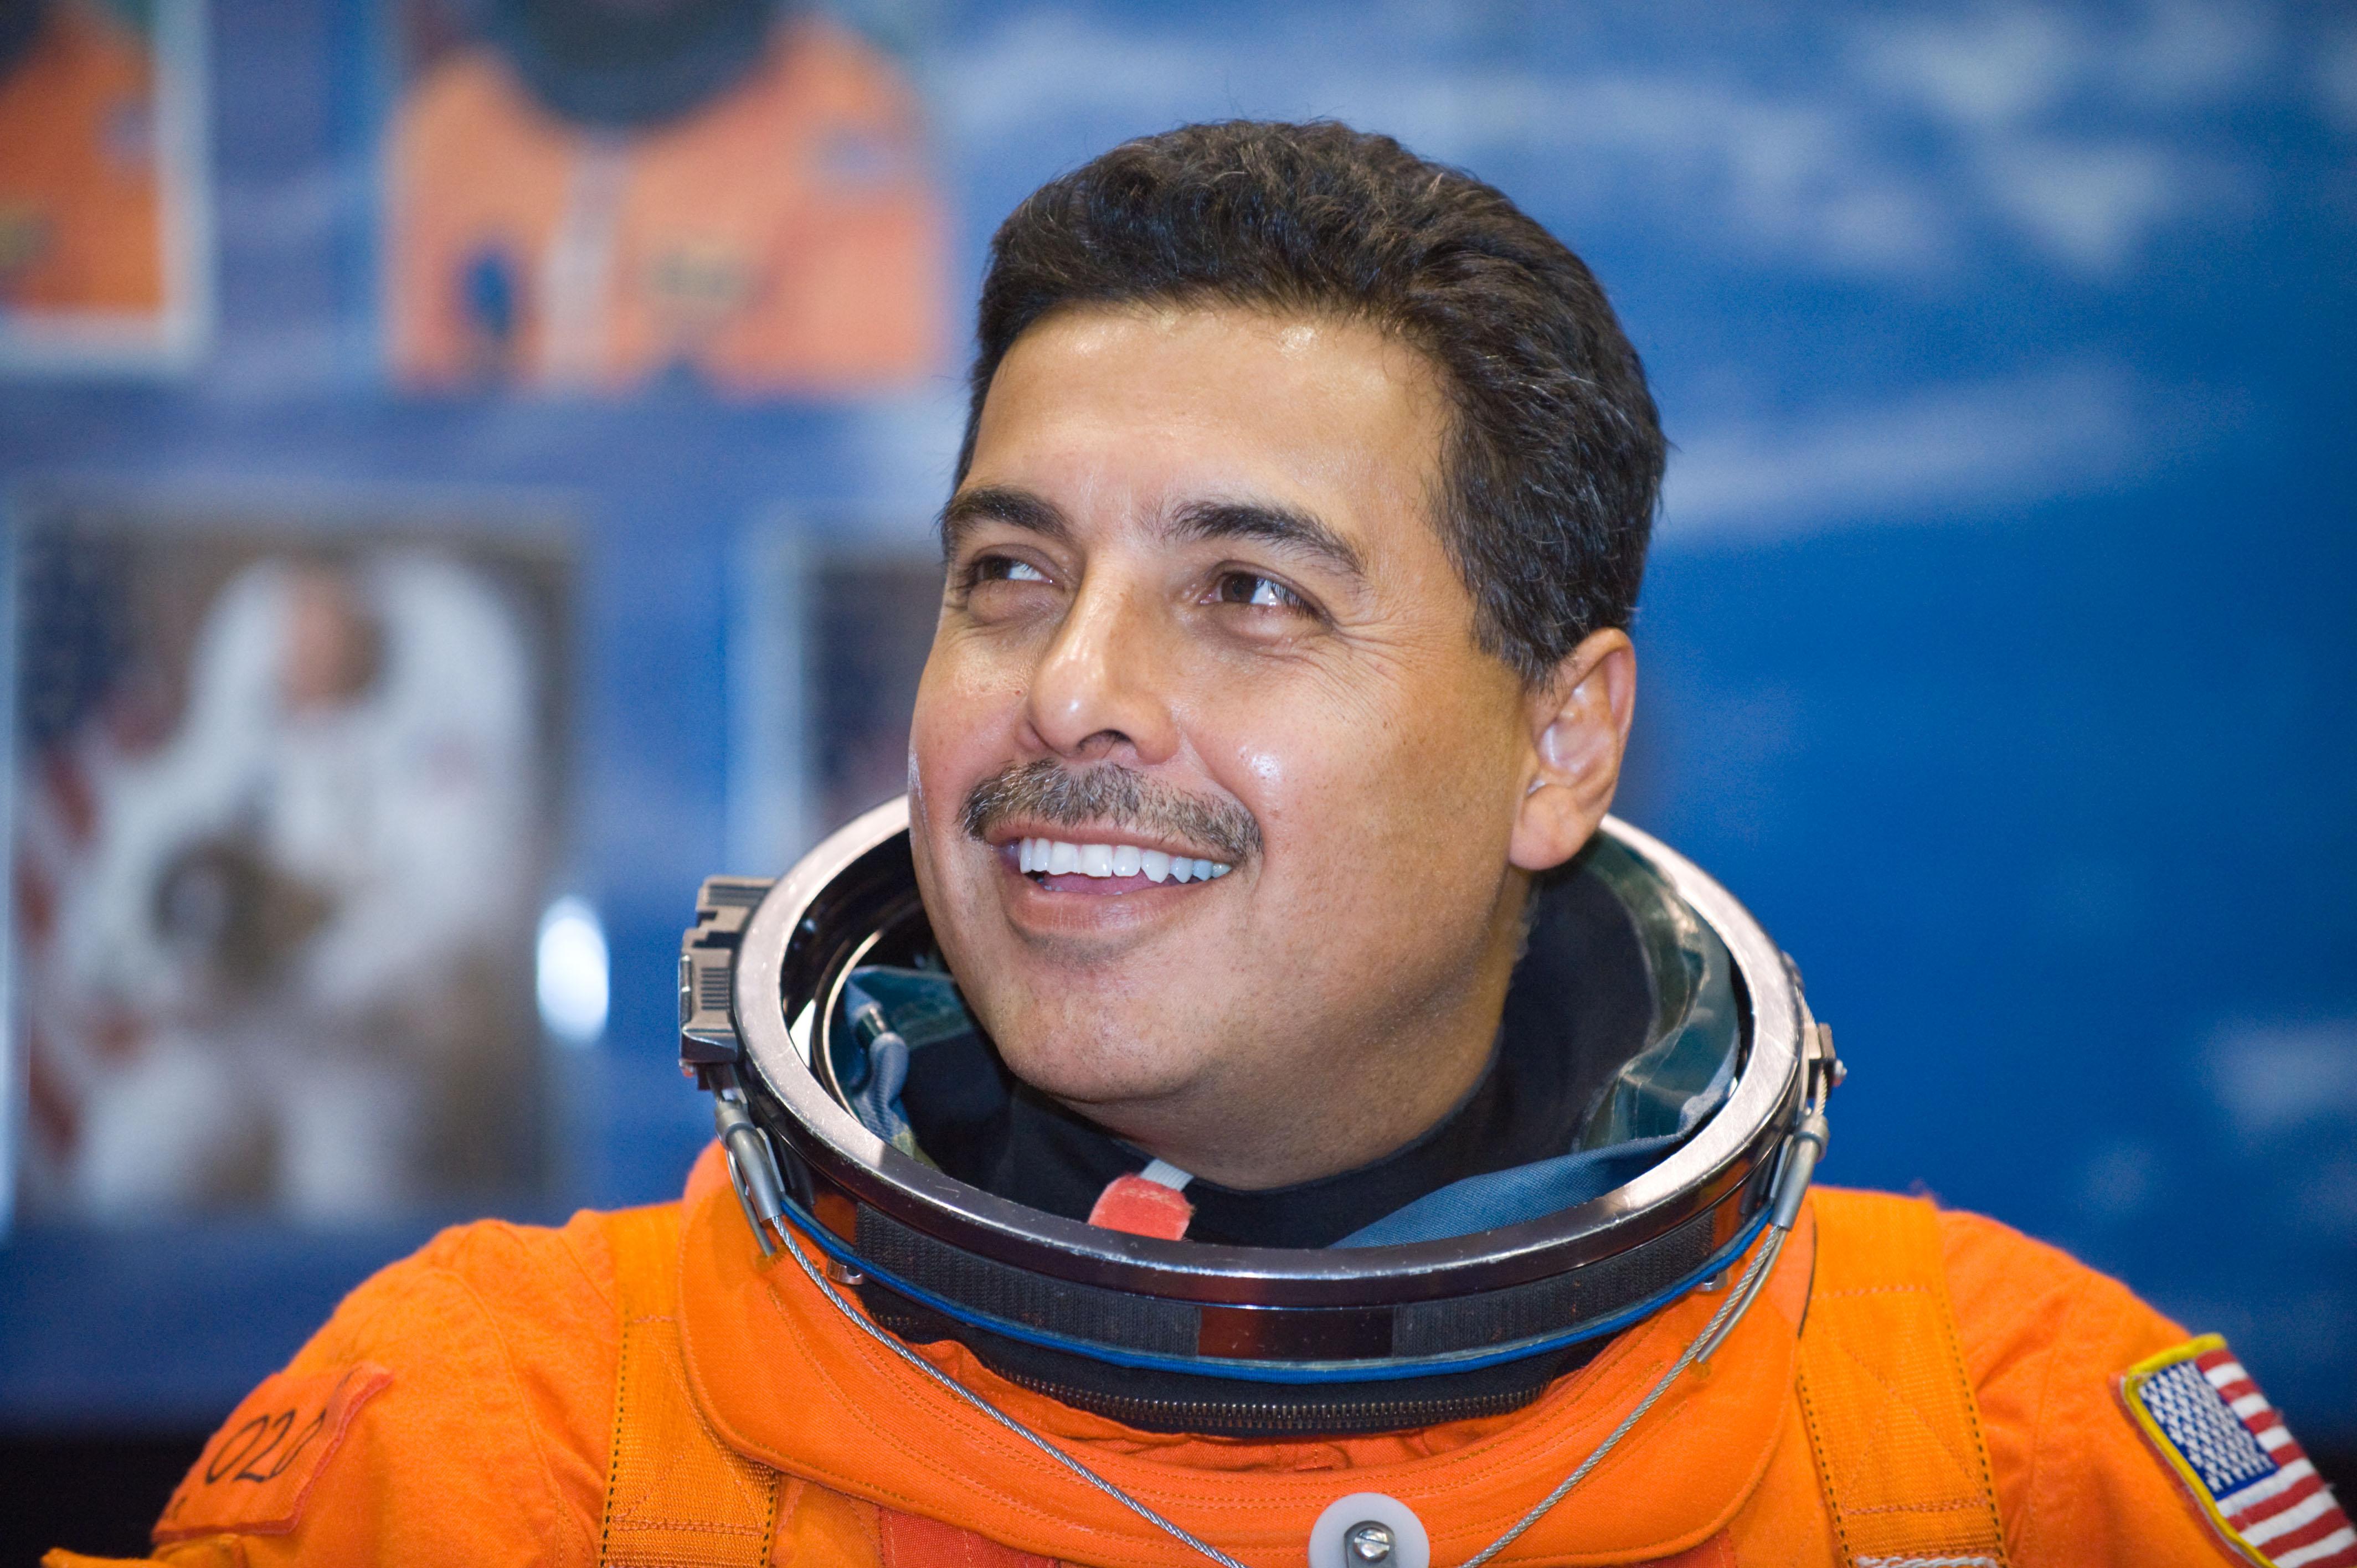 father jose hernandez astronaut - photo #6